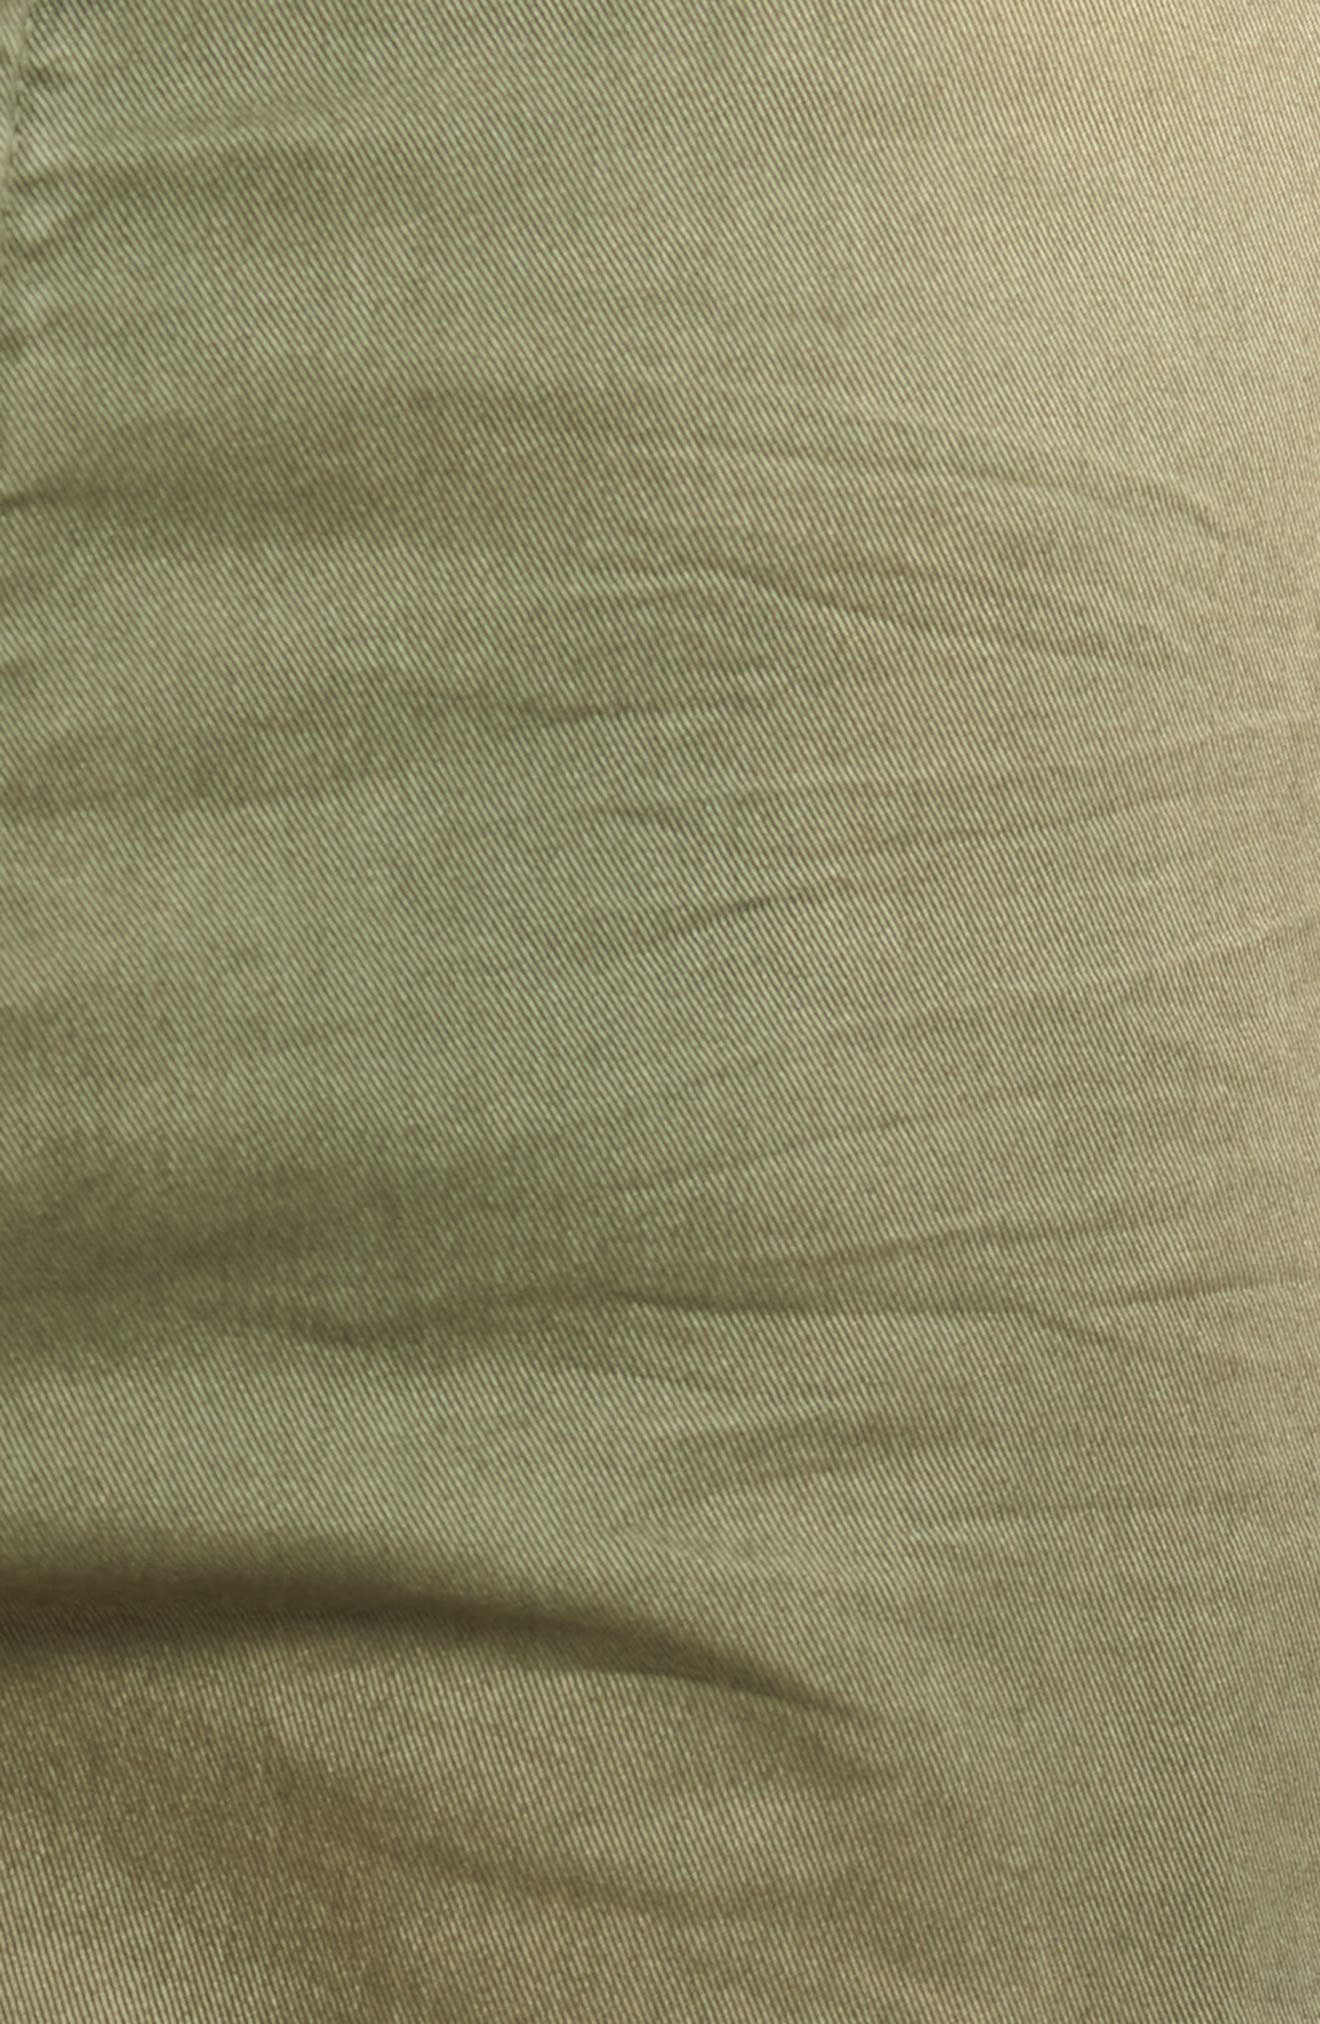 Washed Cargo Shorts,                             Alternate thumbnail 5, color,                             310